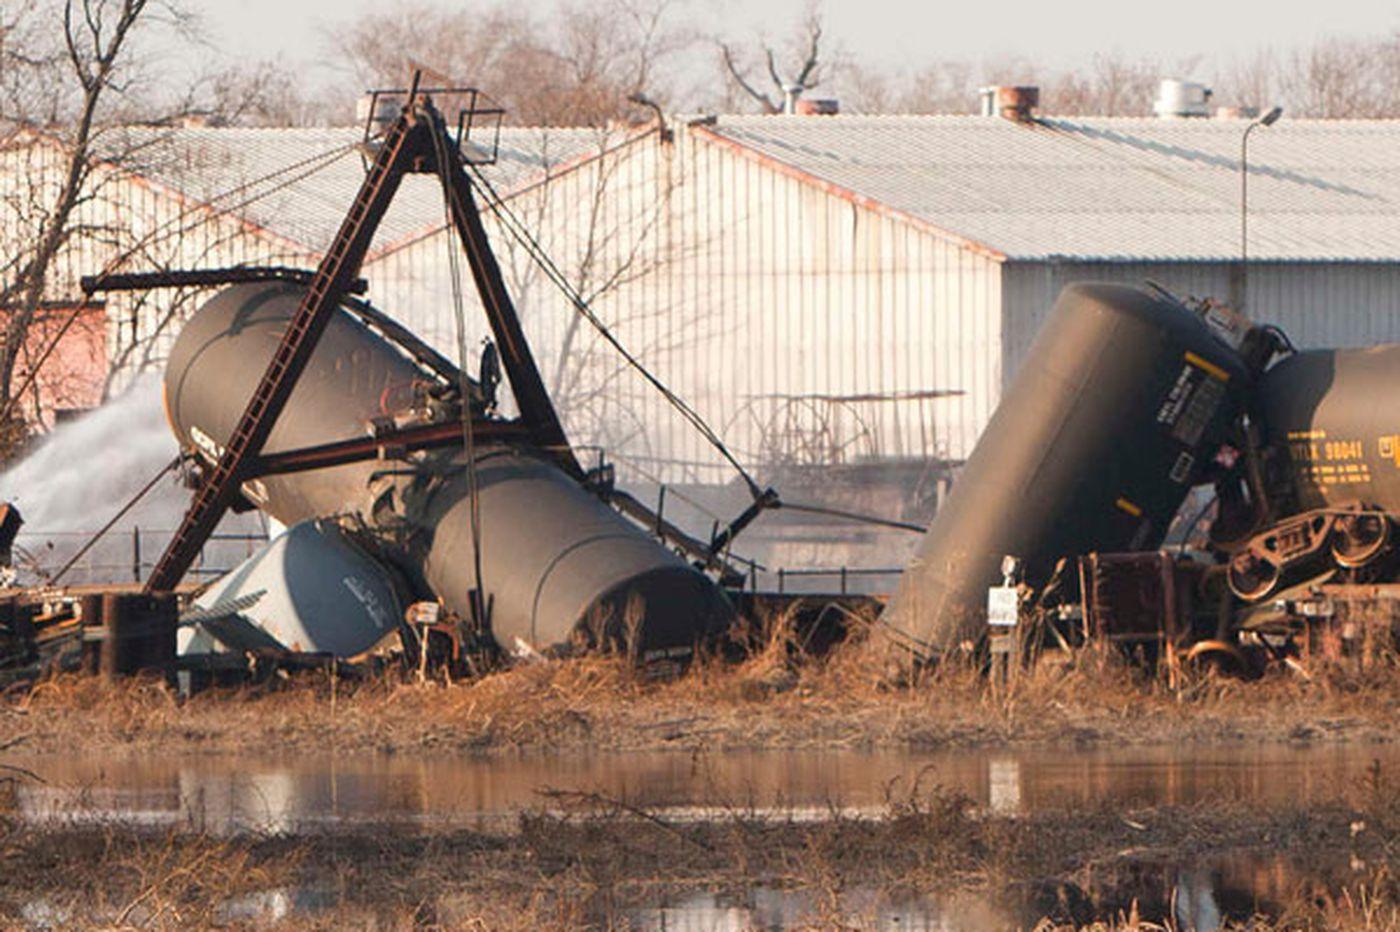 Paulsboro citizens seek air monitors, evacuation plans